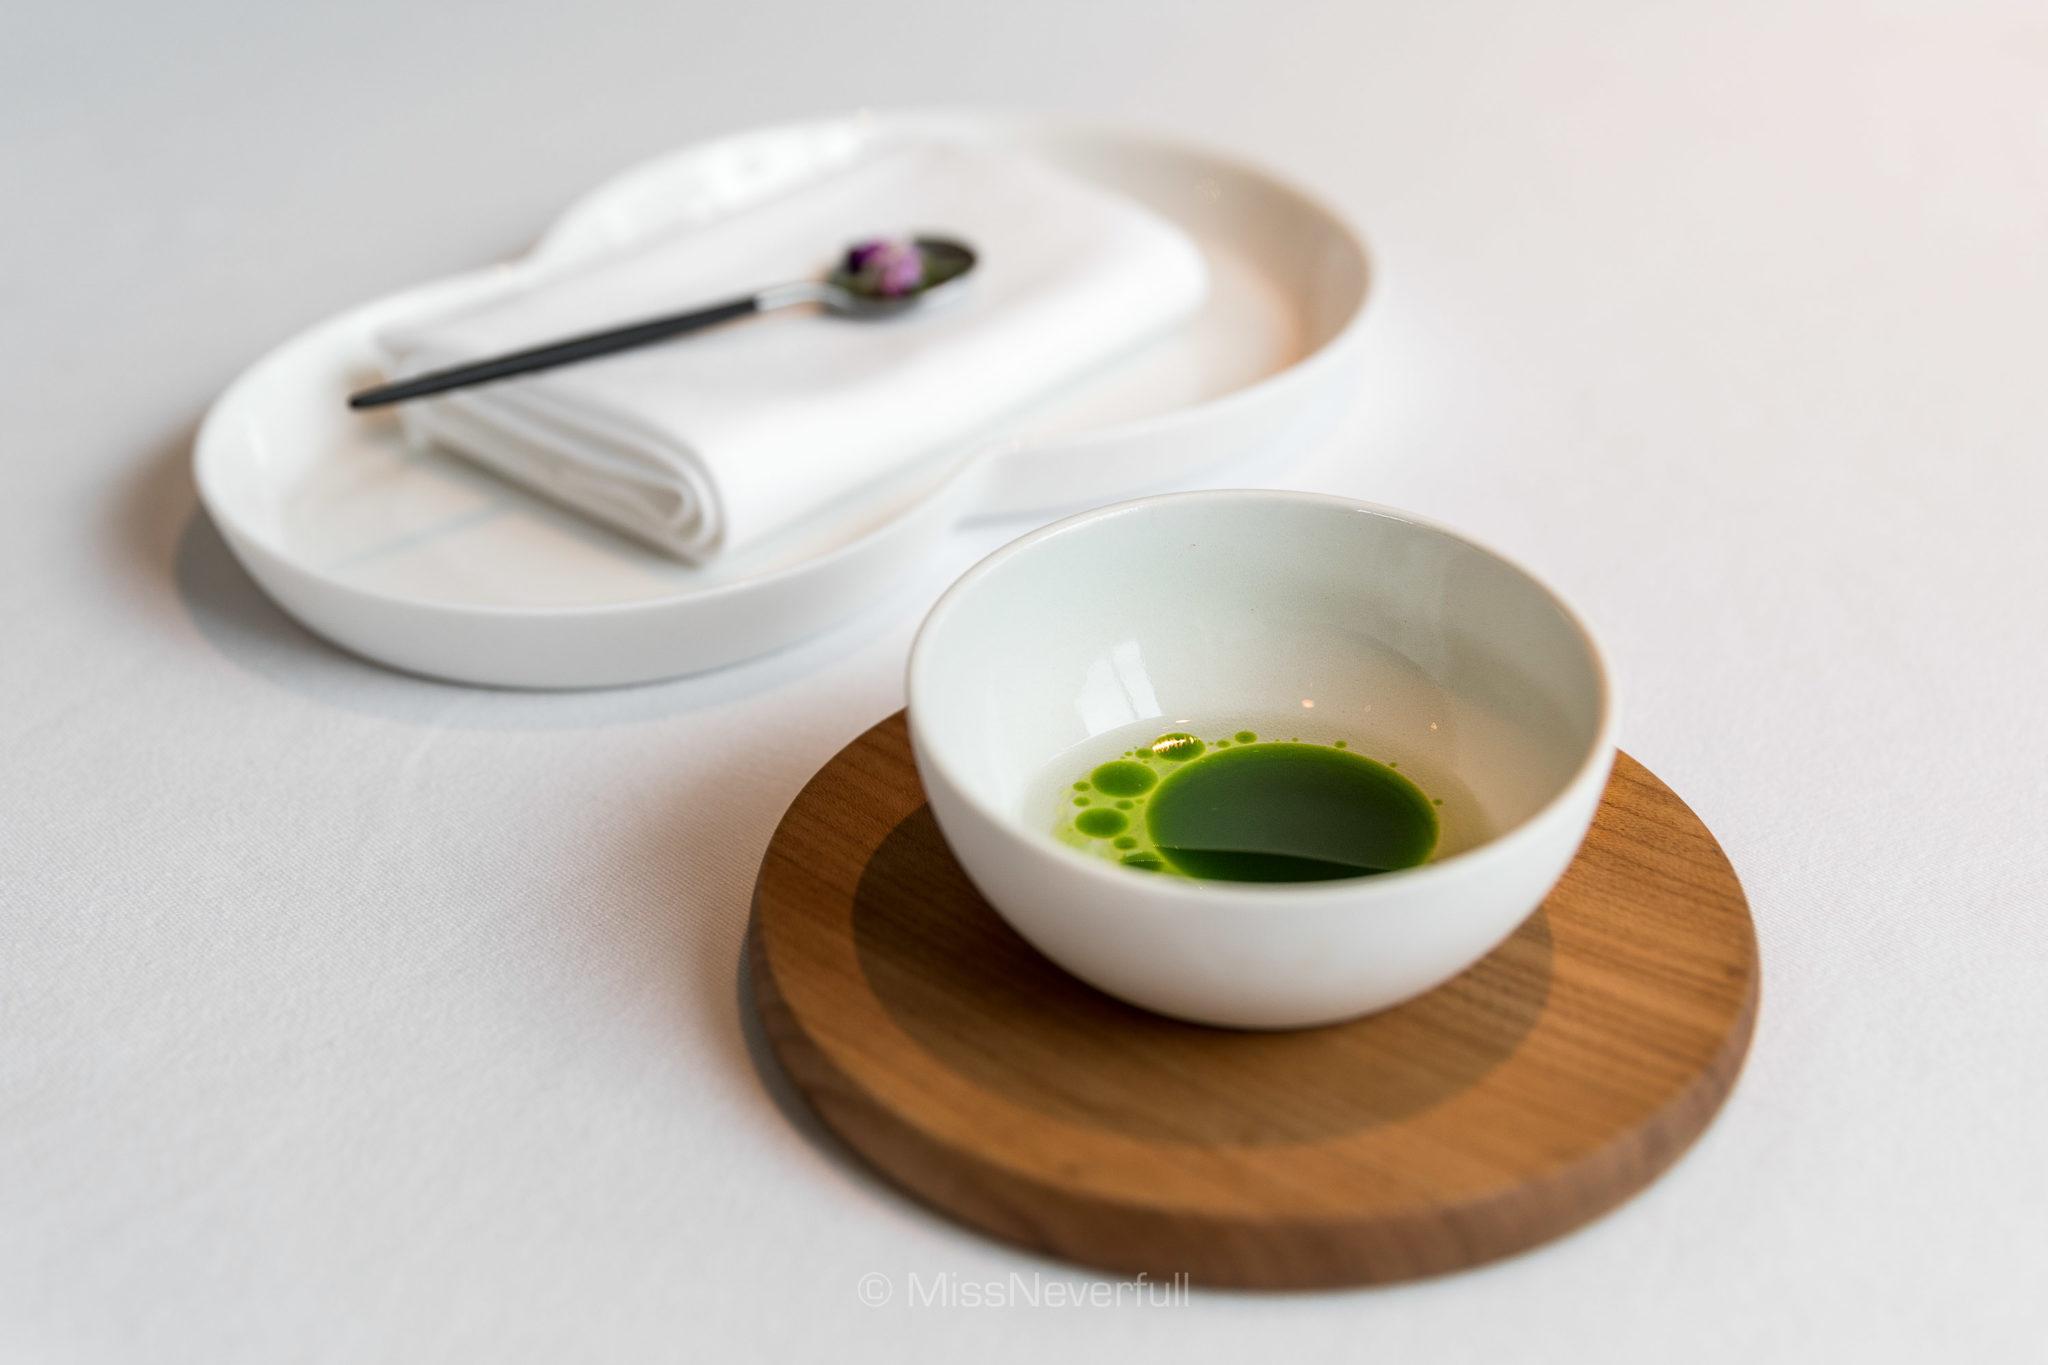 1.3 Tomato water & aromatic herbs